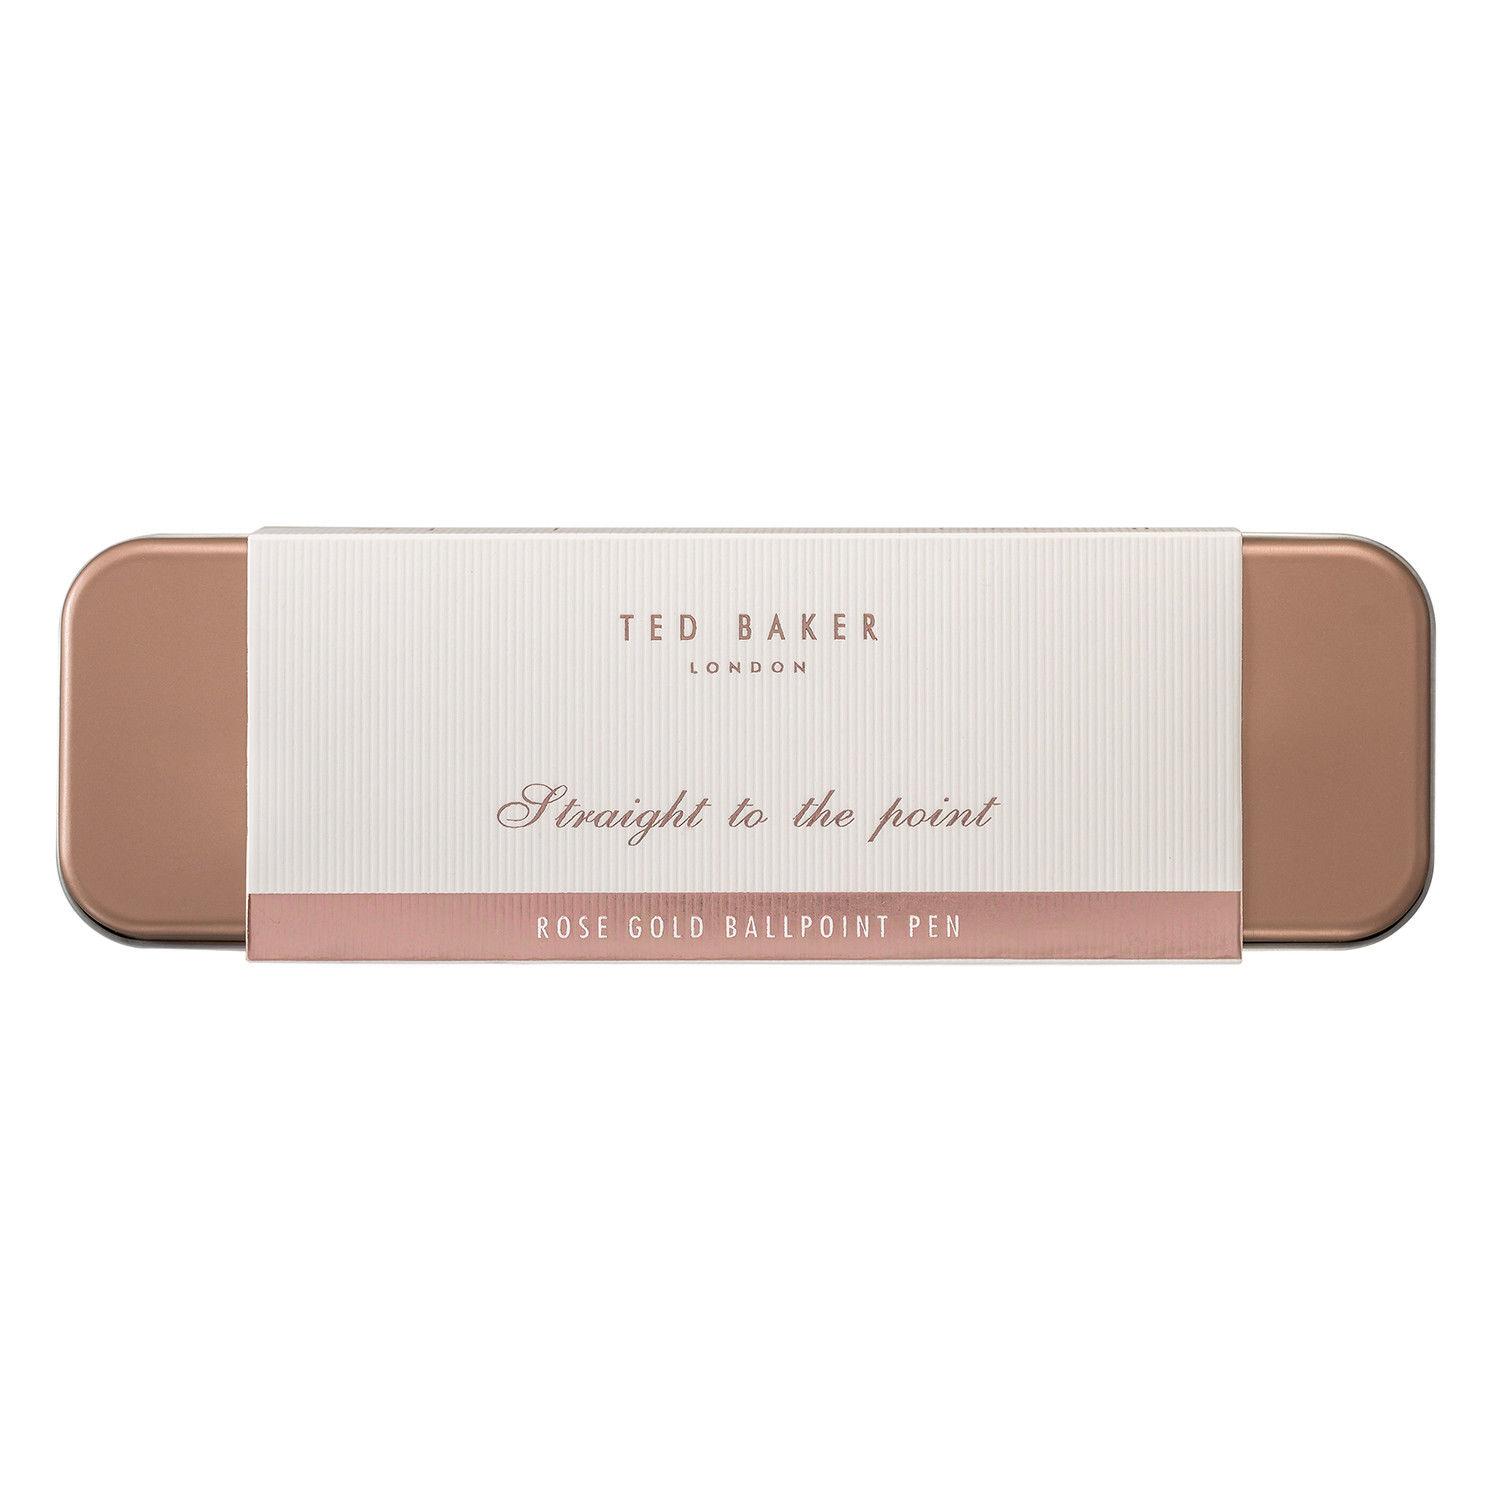 Ted Baker – Rose Gold Premium Ballpoint Pen in Presentation Metal Gift Tin